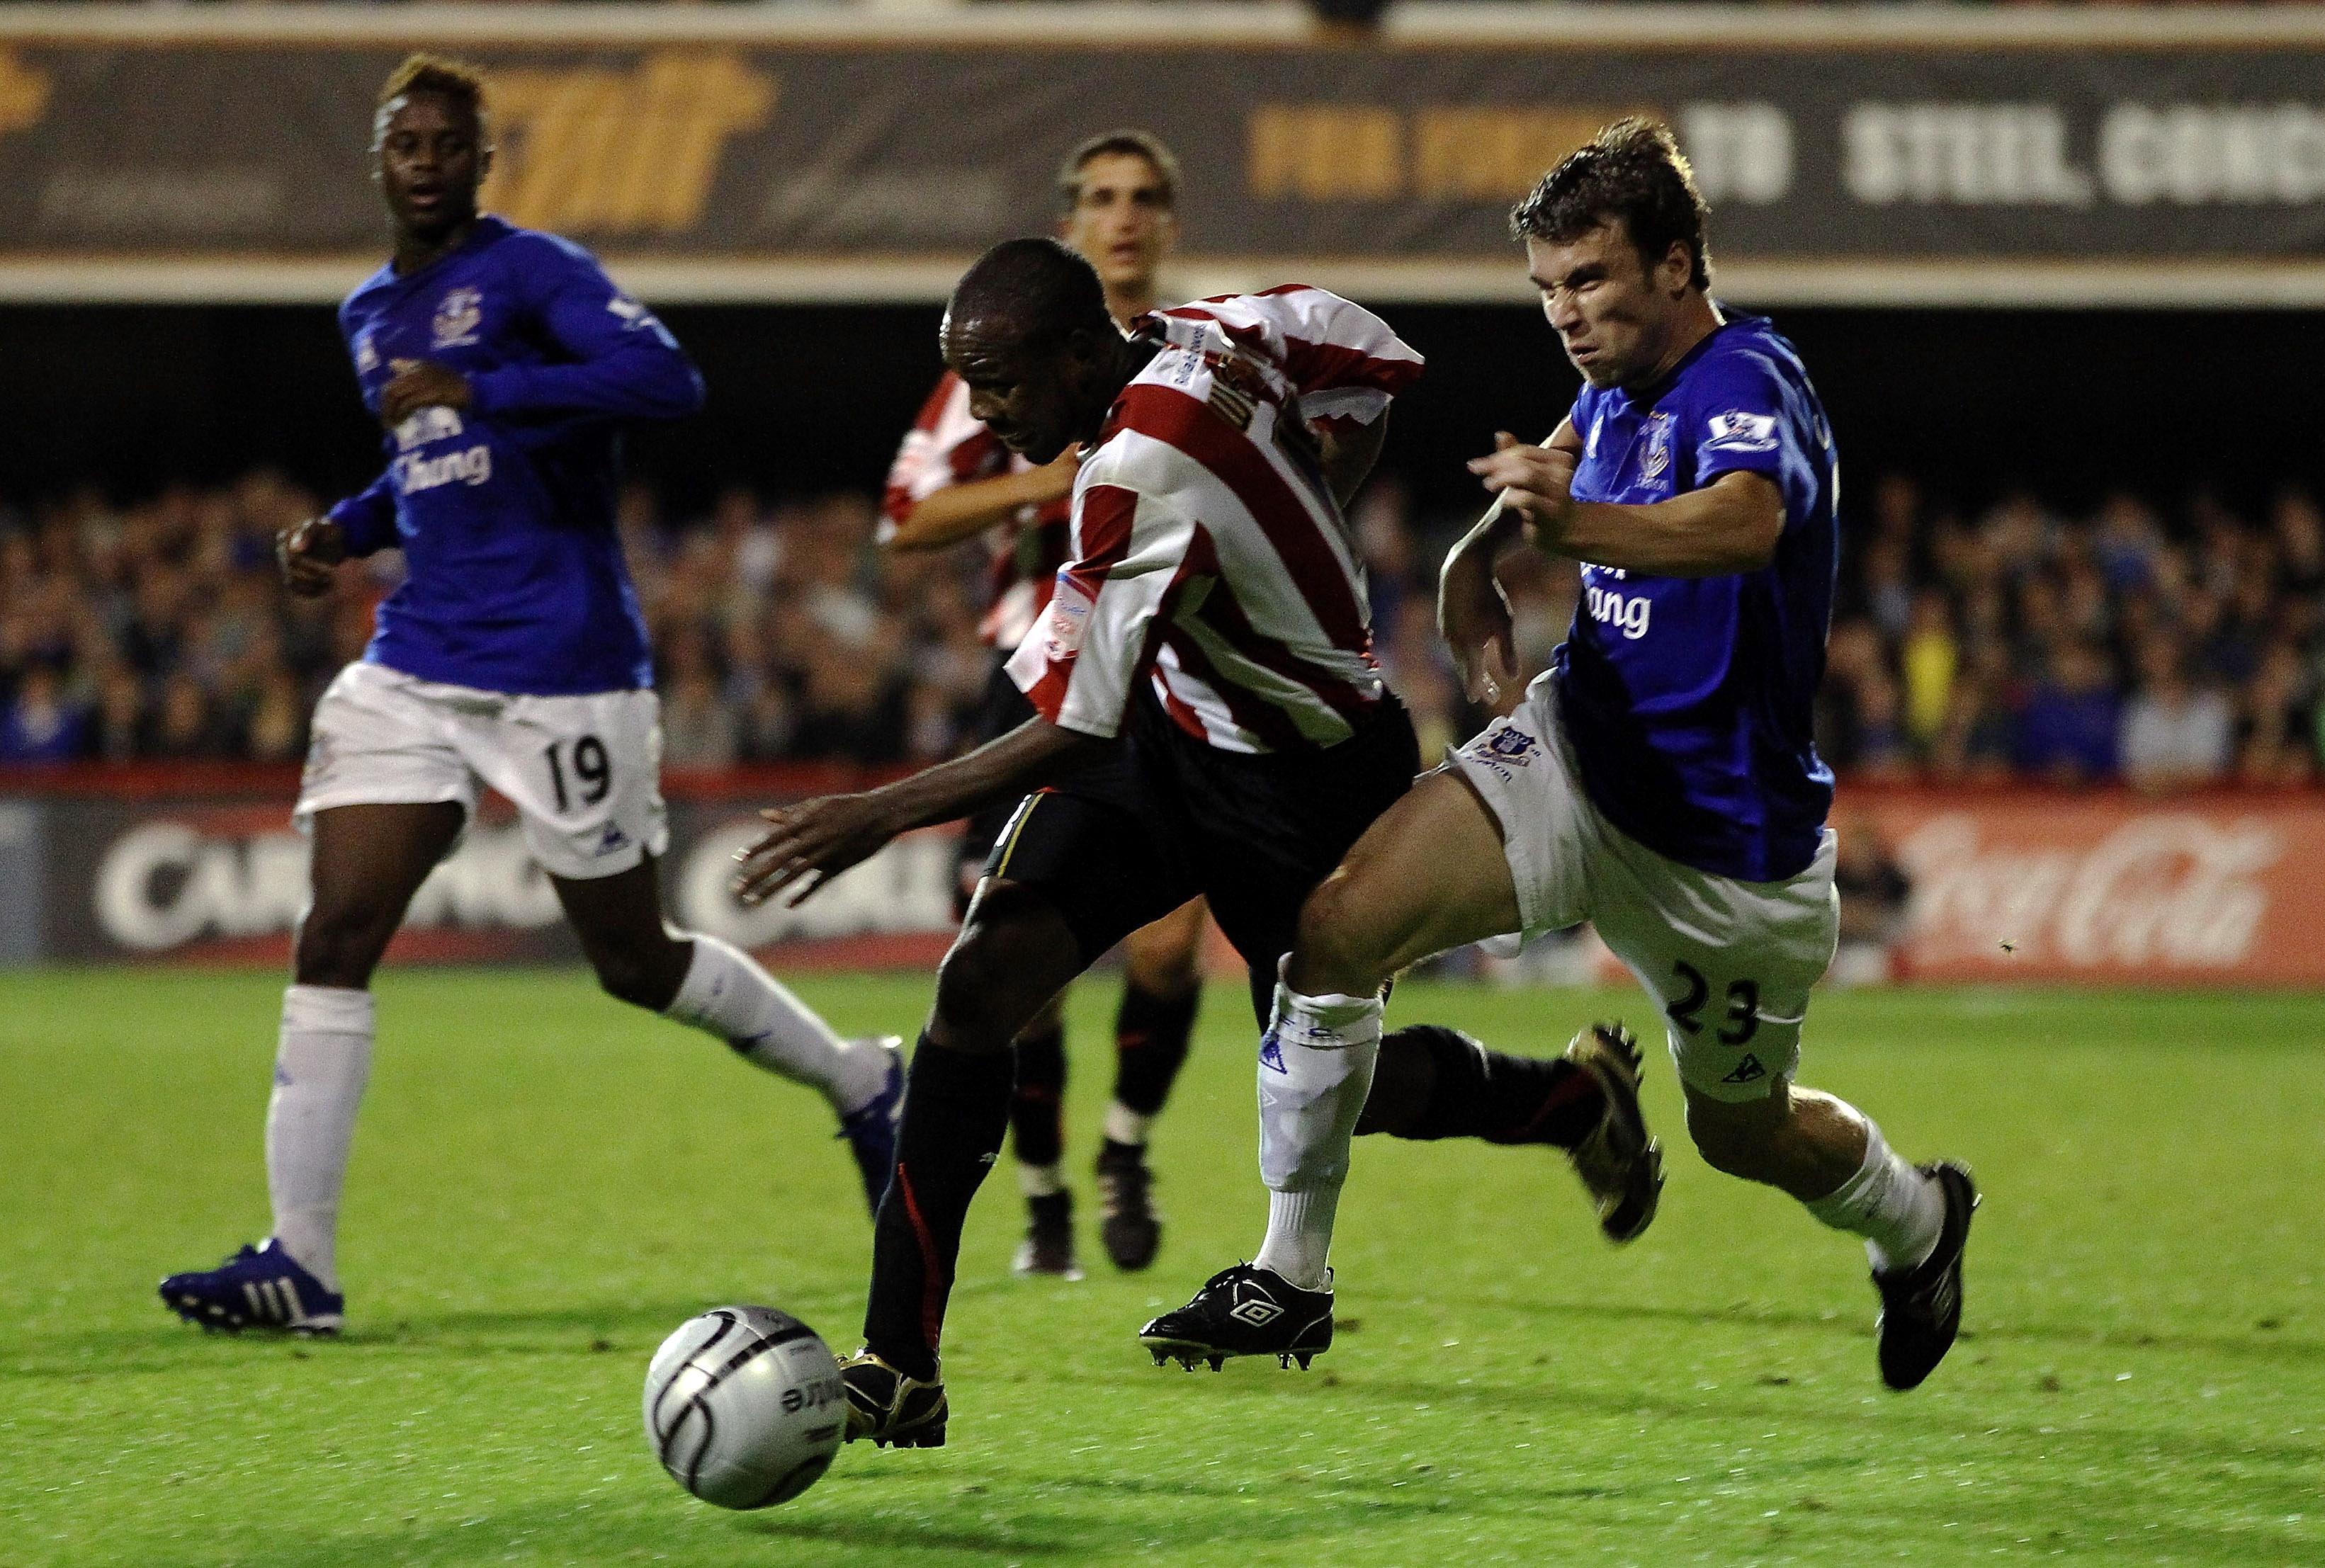 Brentford v Everton - Carling Cup 3rd Round